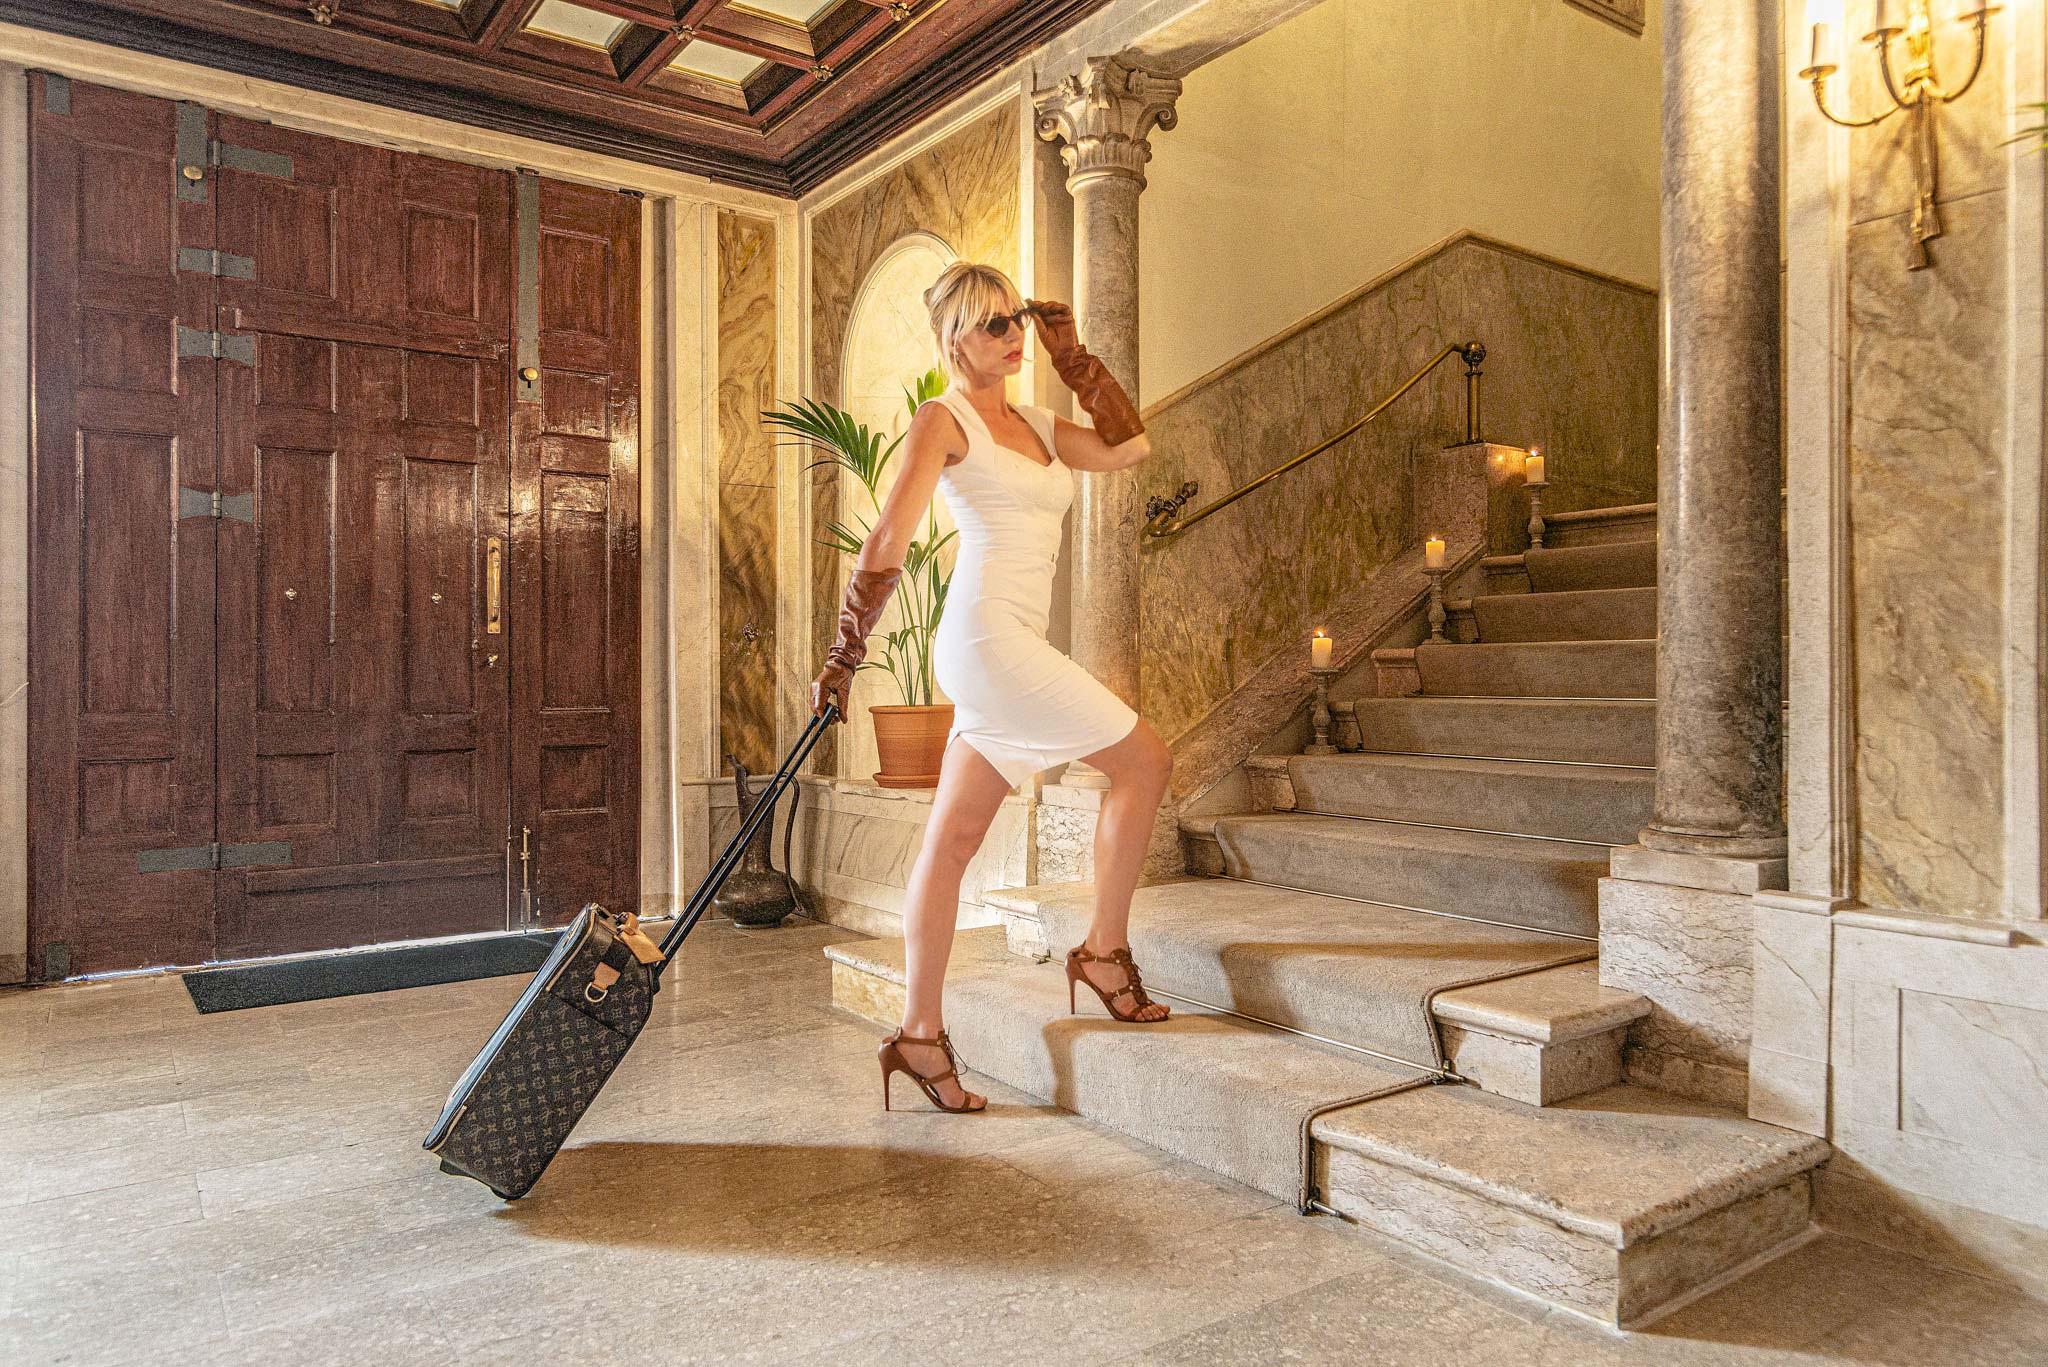 Elisabetta-D-Over-40-Creative-Models-Agenzia-Modelle-Brescia-13